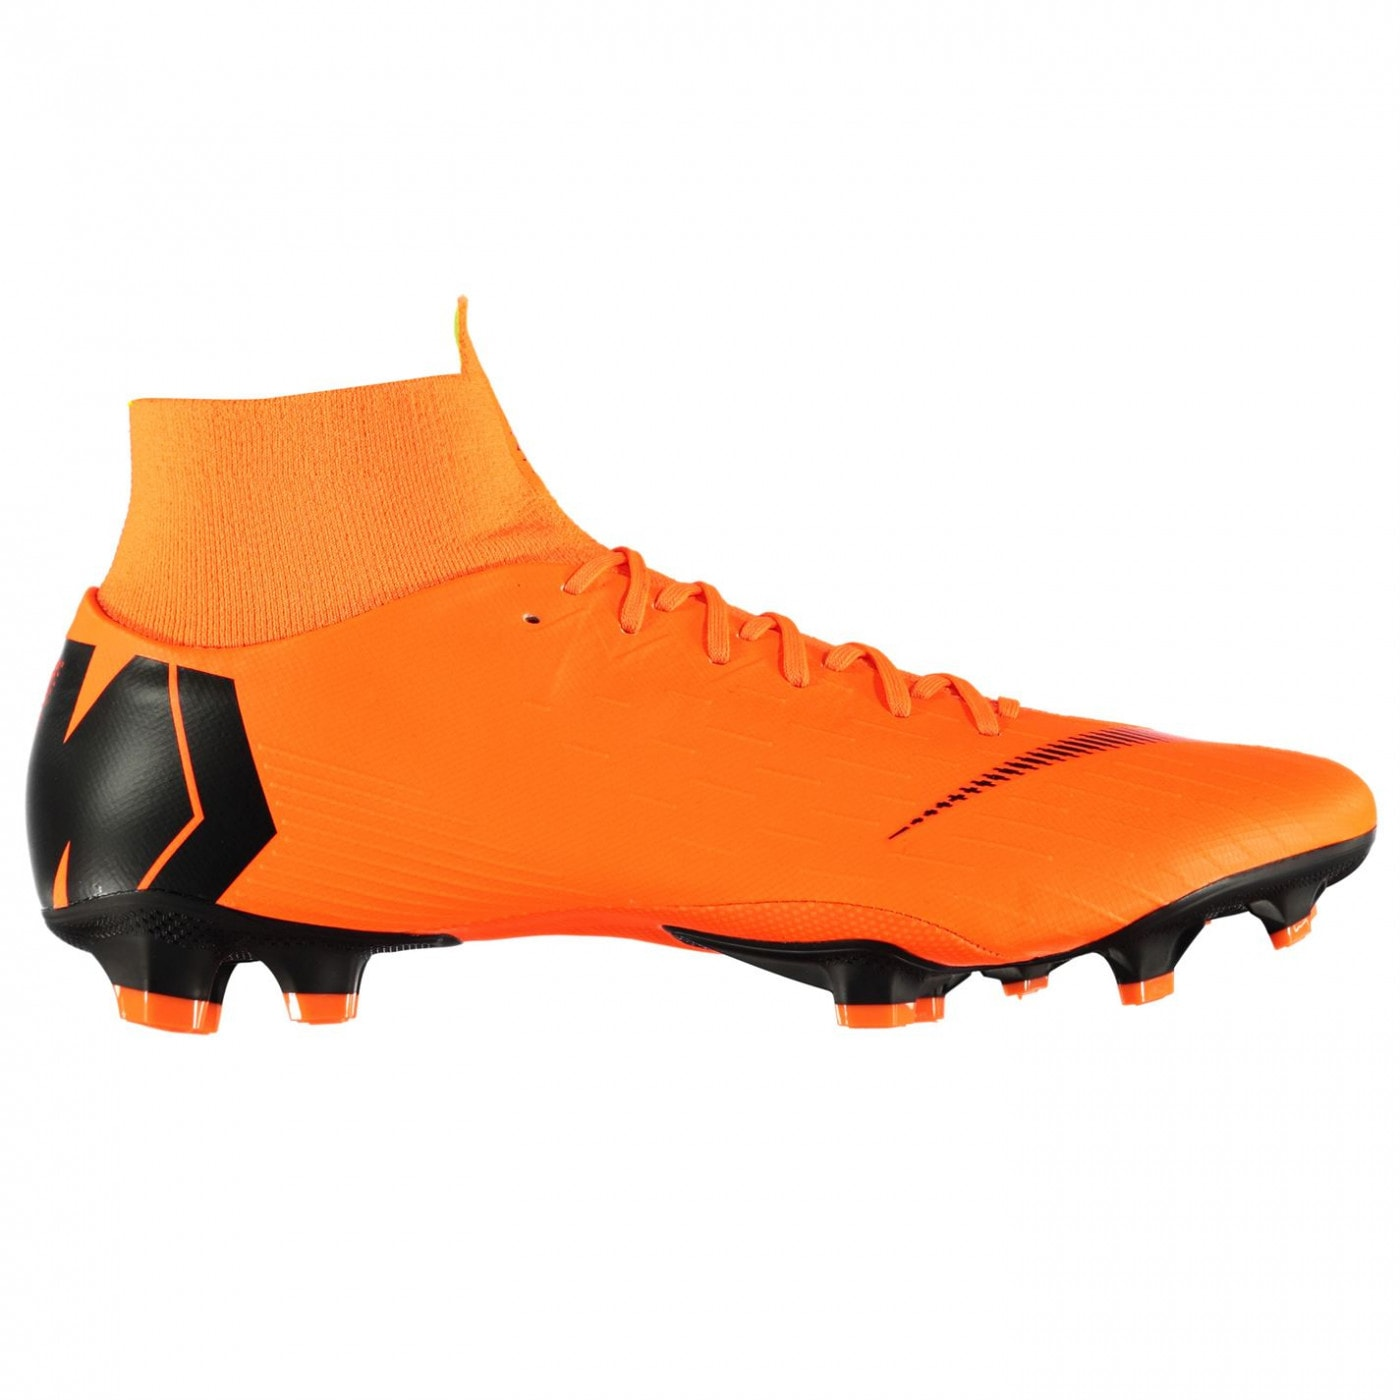 29200e7e11a Nike Mercurial Superfly Pro Mens FG Football Boots - FACTCOOL